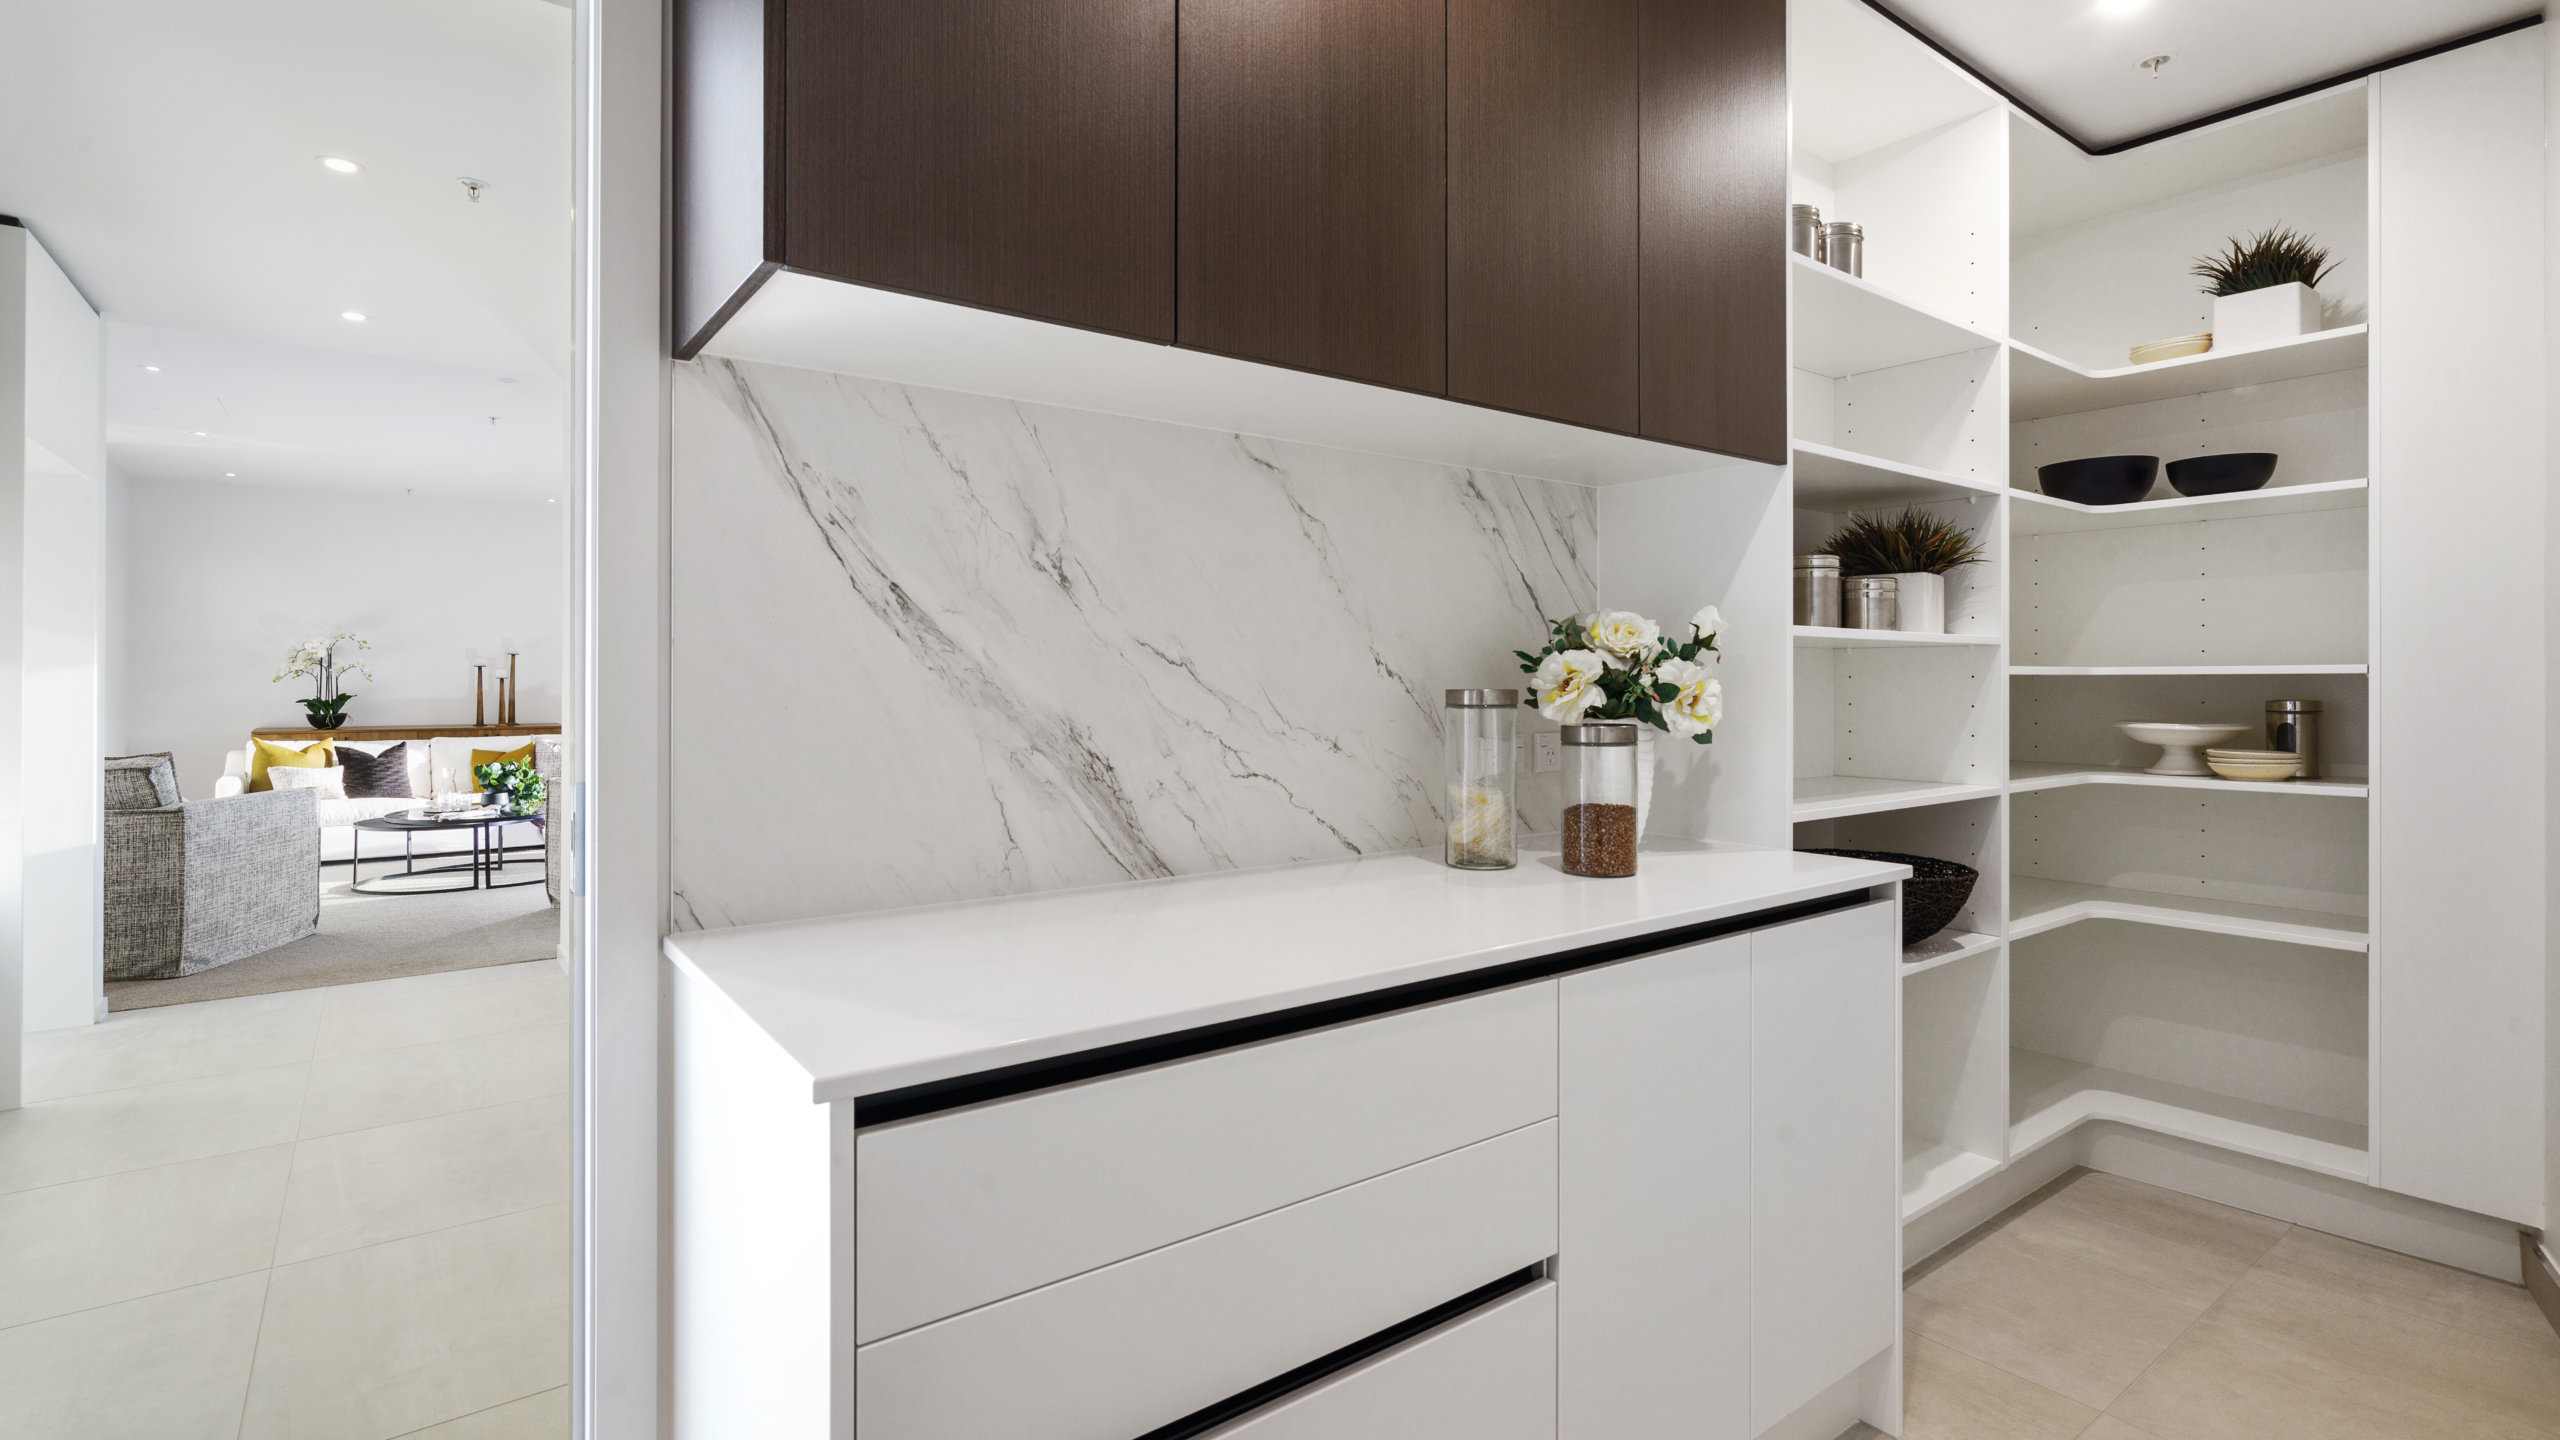 Waterford retirement village luxury apartment kitchen pantry